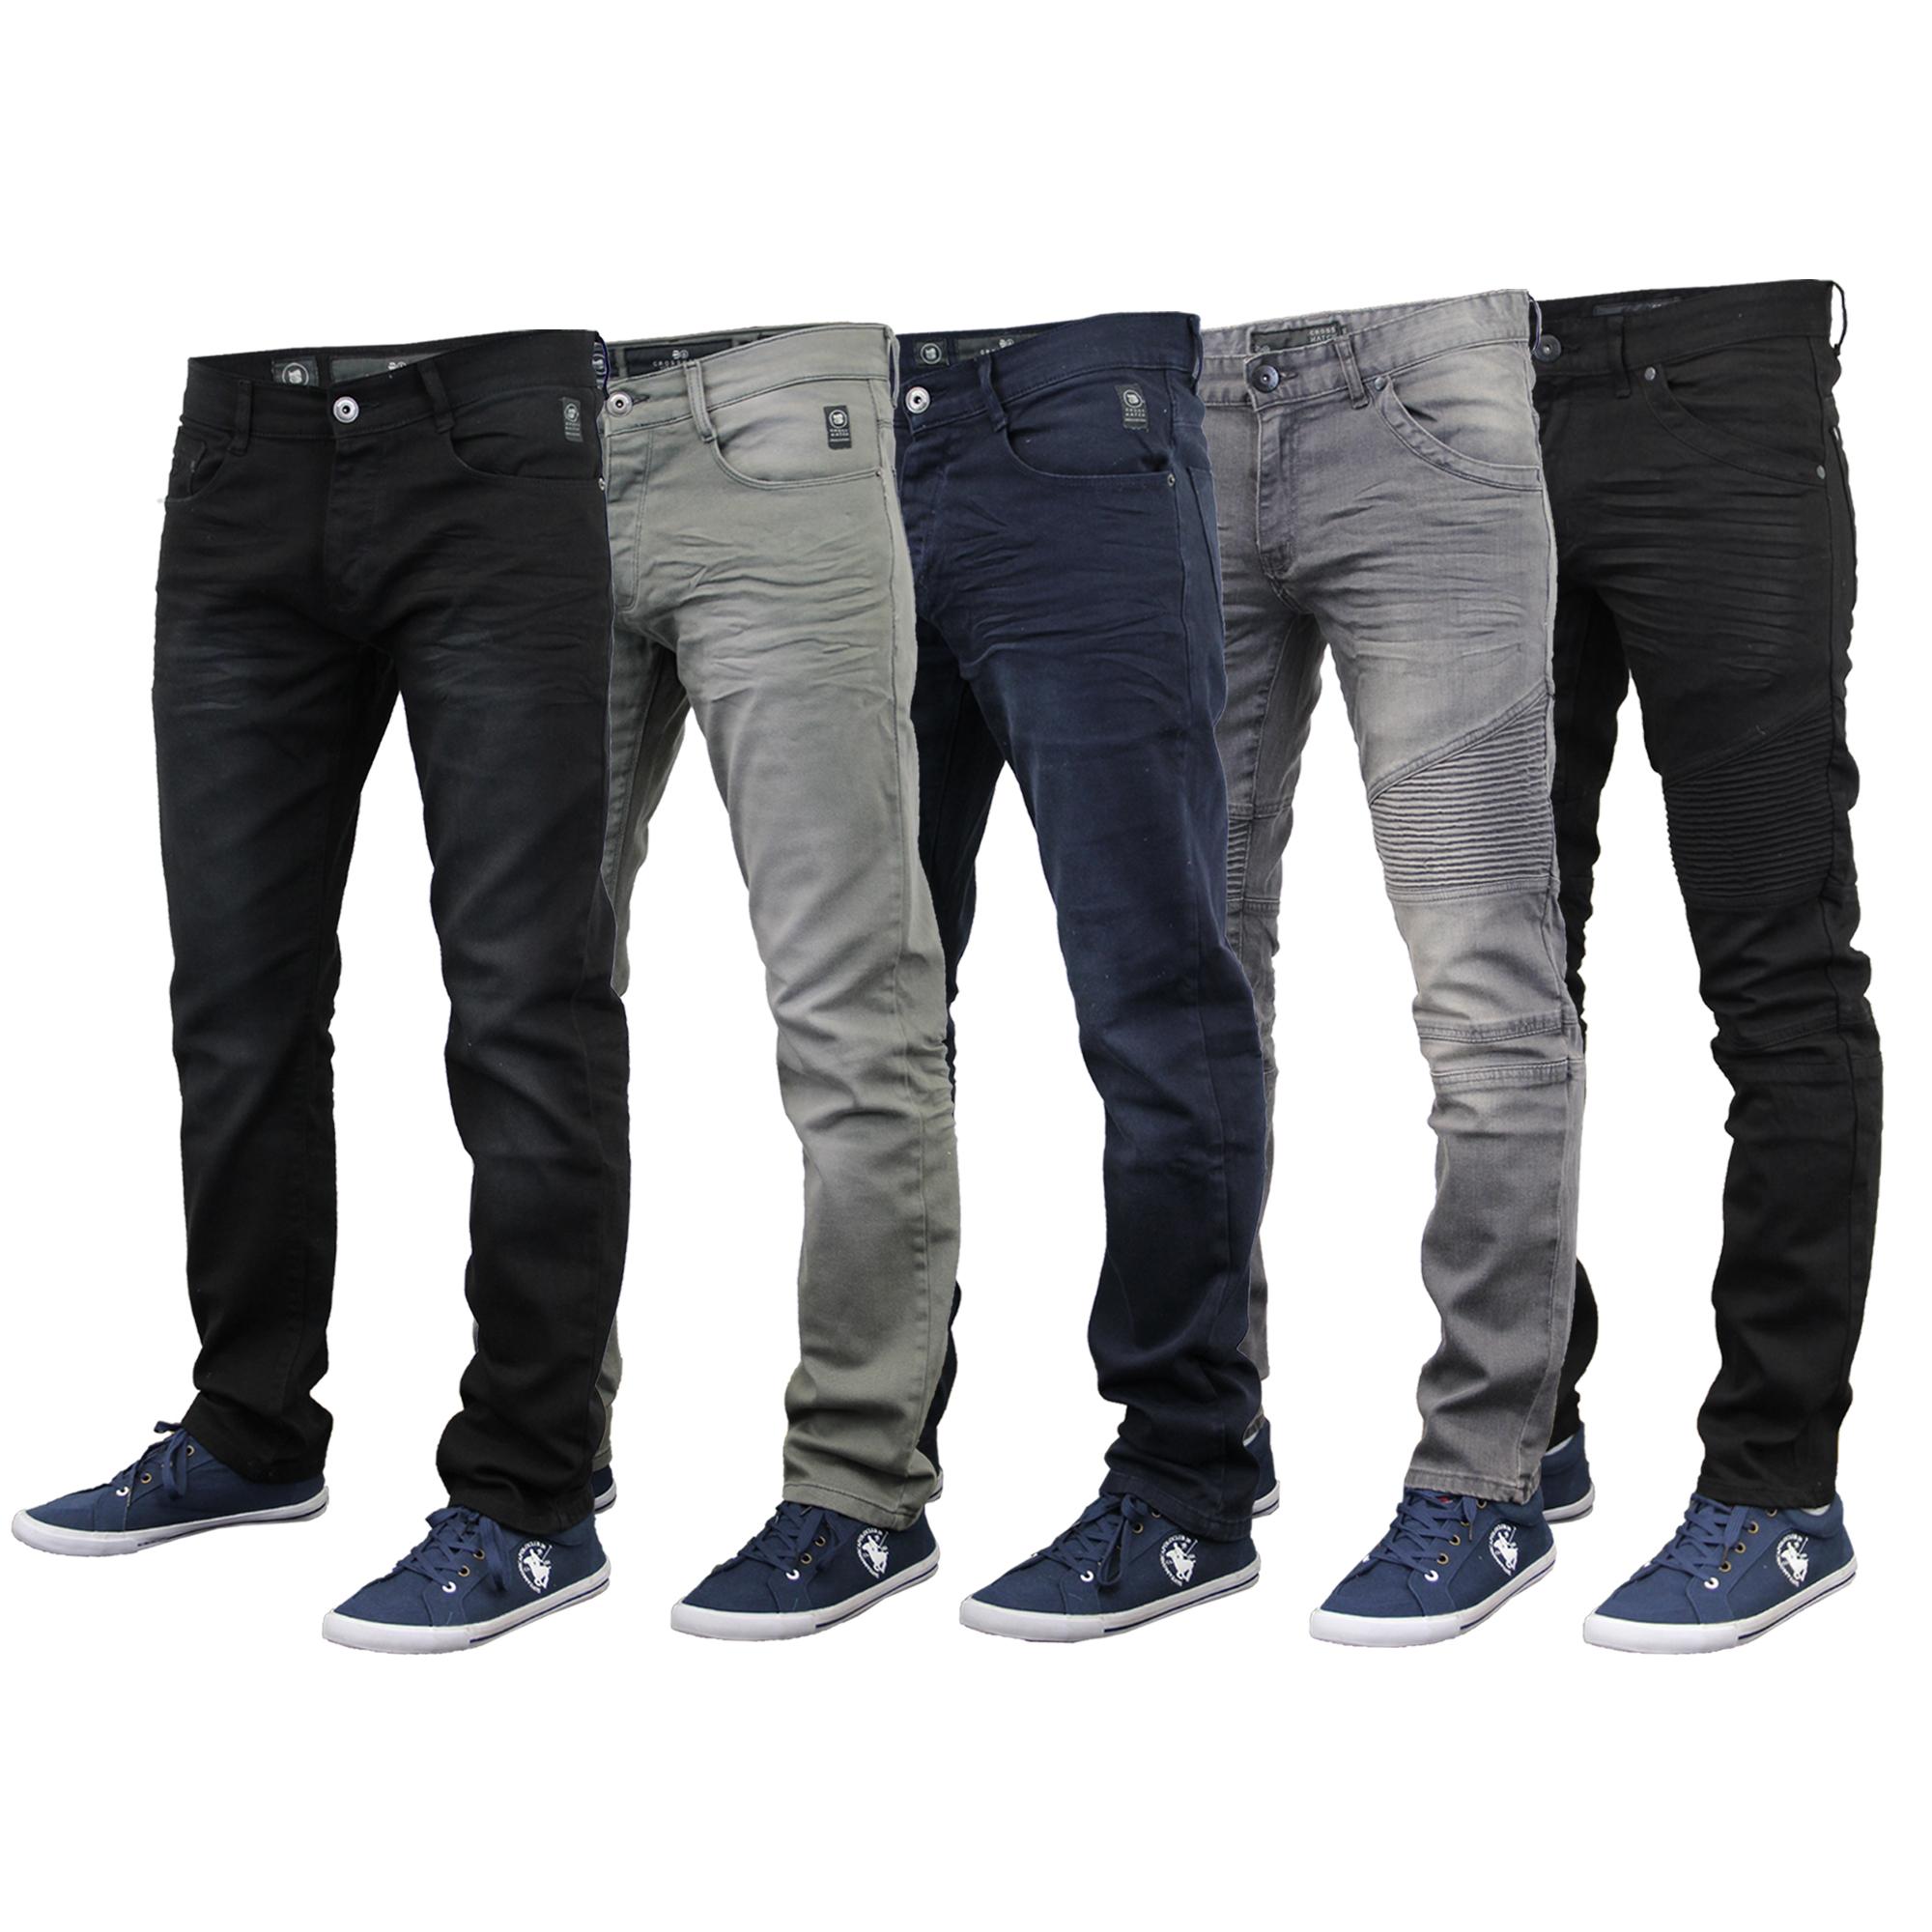 9dfa3a1c406 Mens Denim Jeans Crosshatch Pants Skinny Slim Fit Trouser Ruched ...